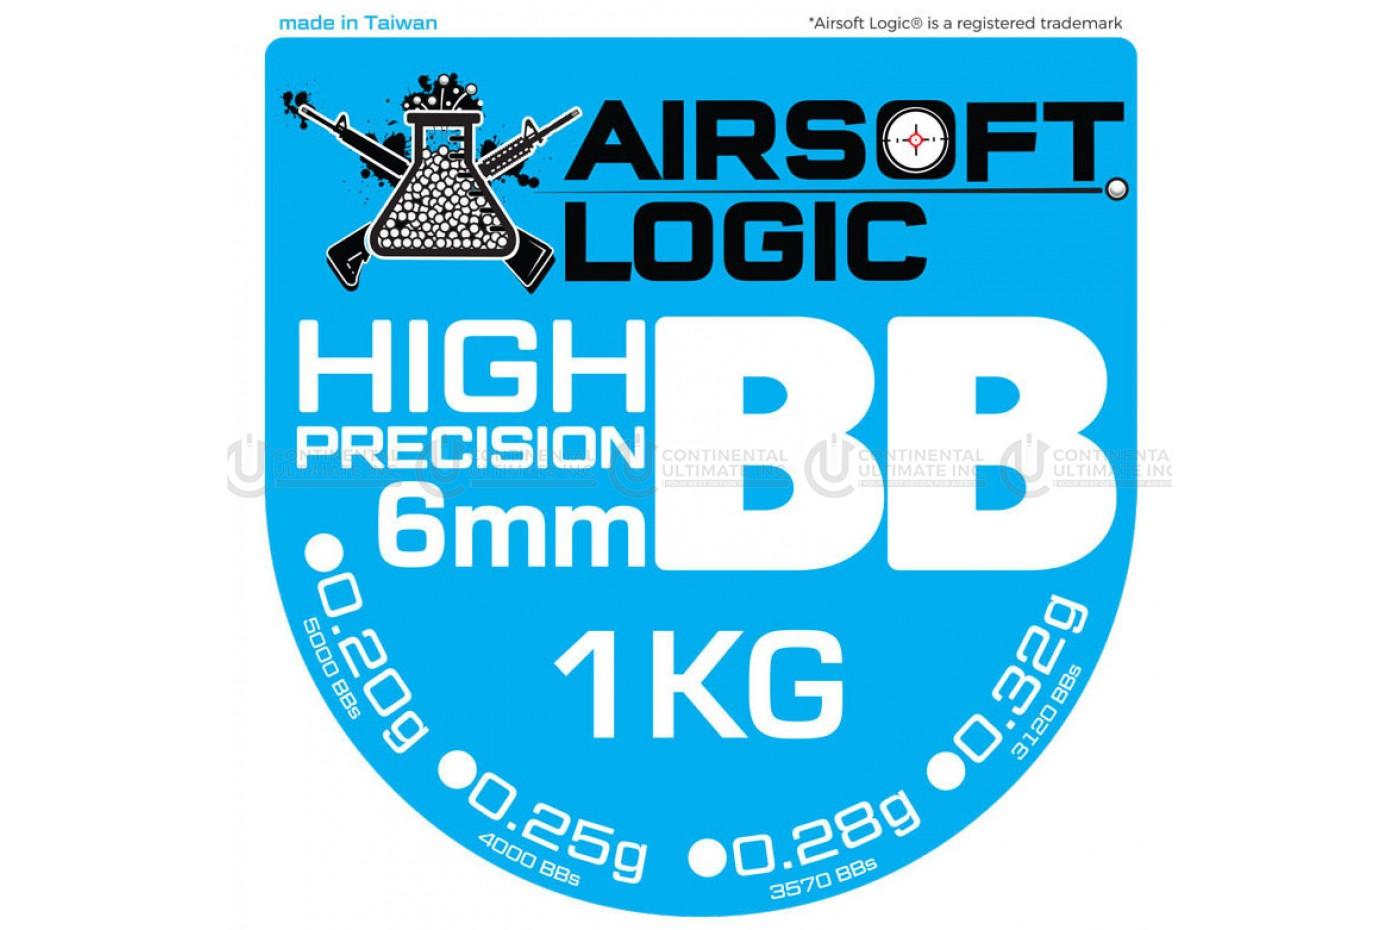 AIRSOFT LOGIC 0.25G BB (1KG)